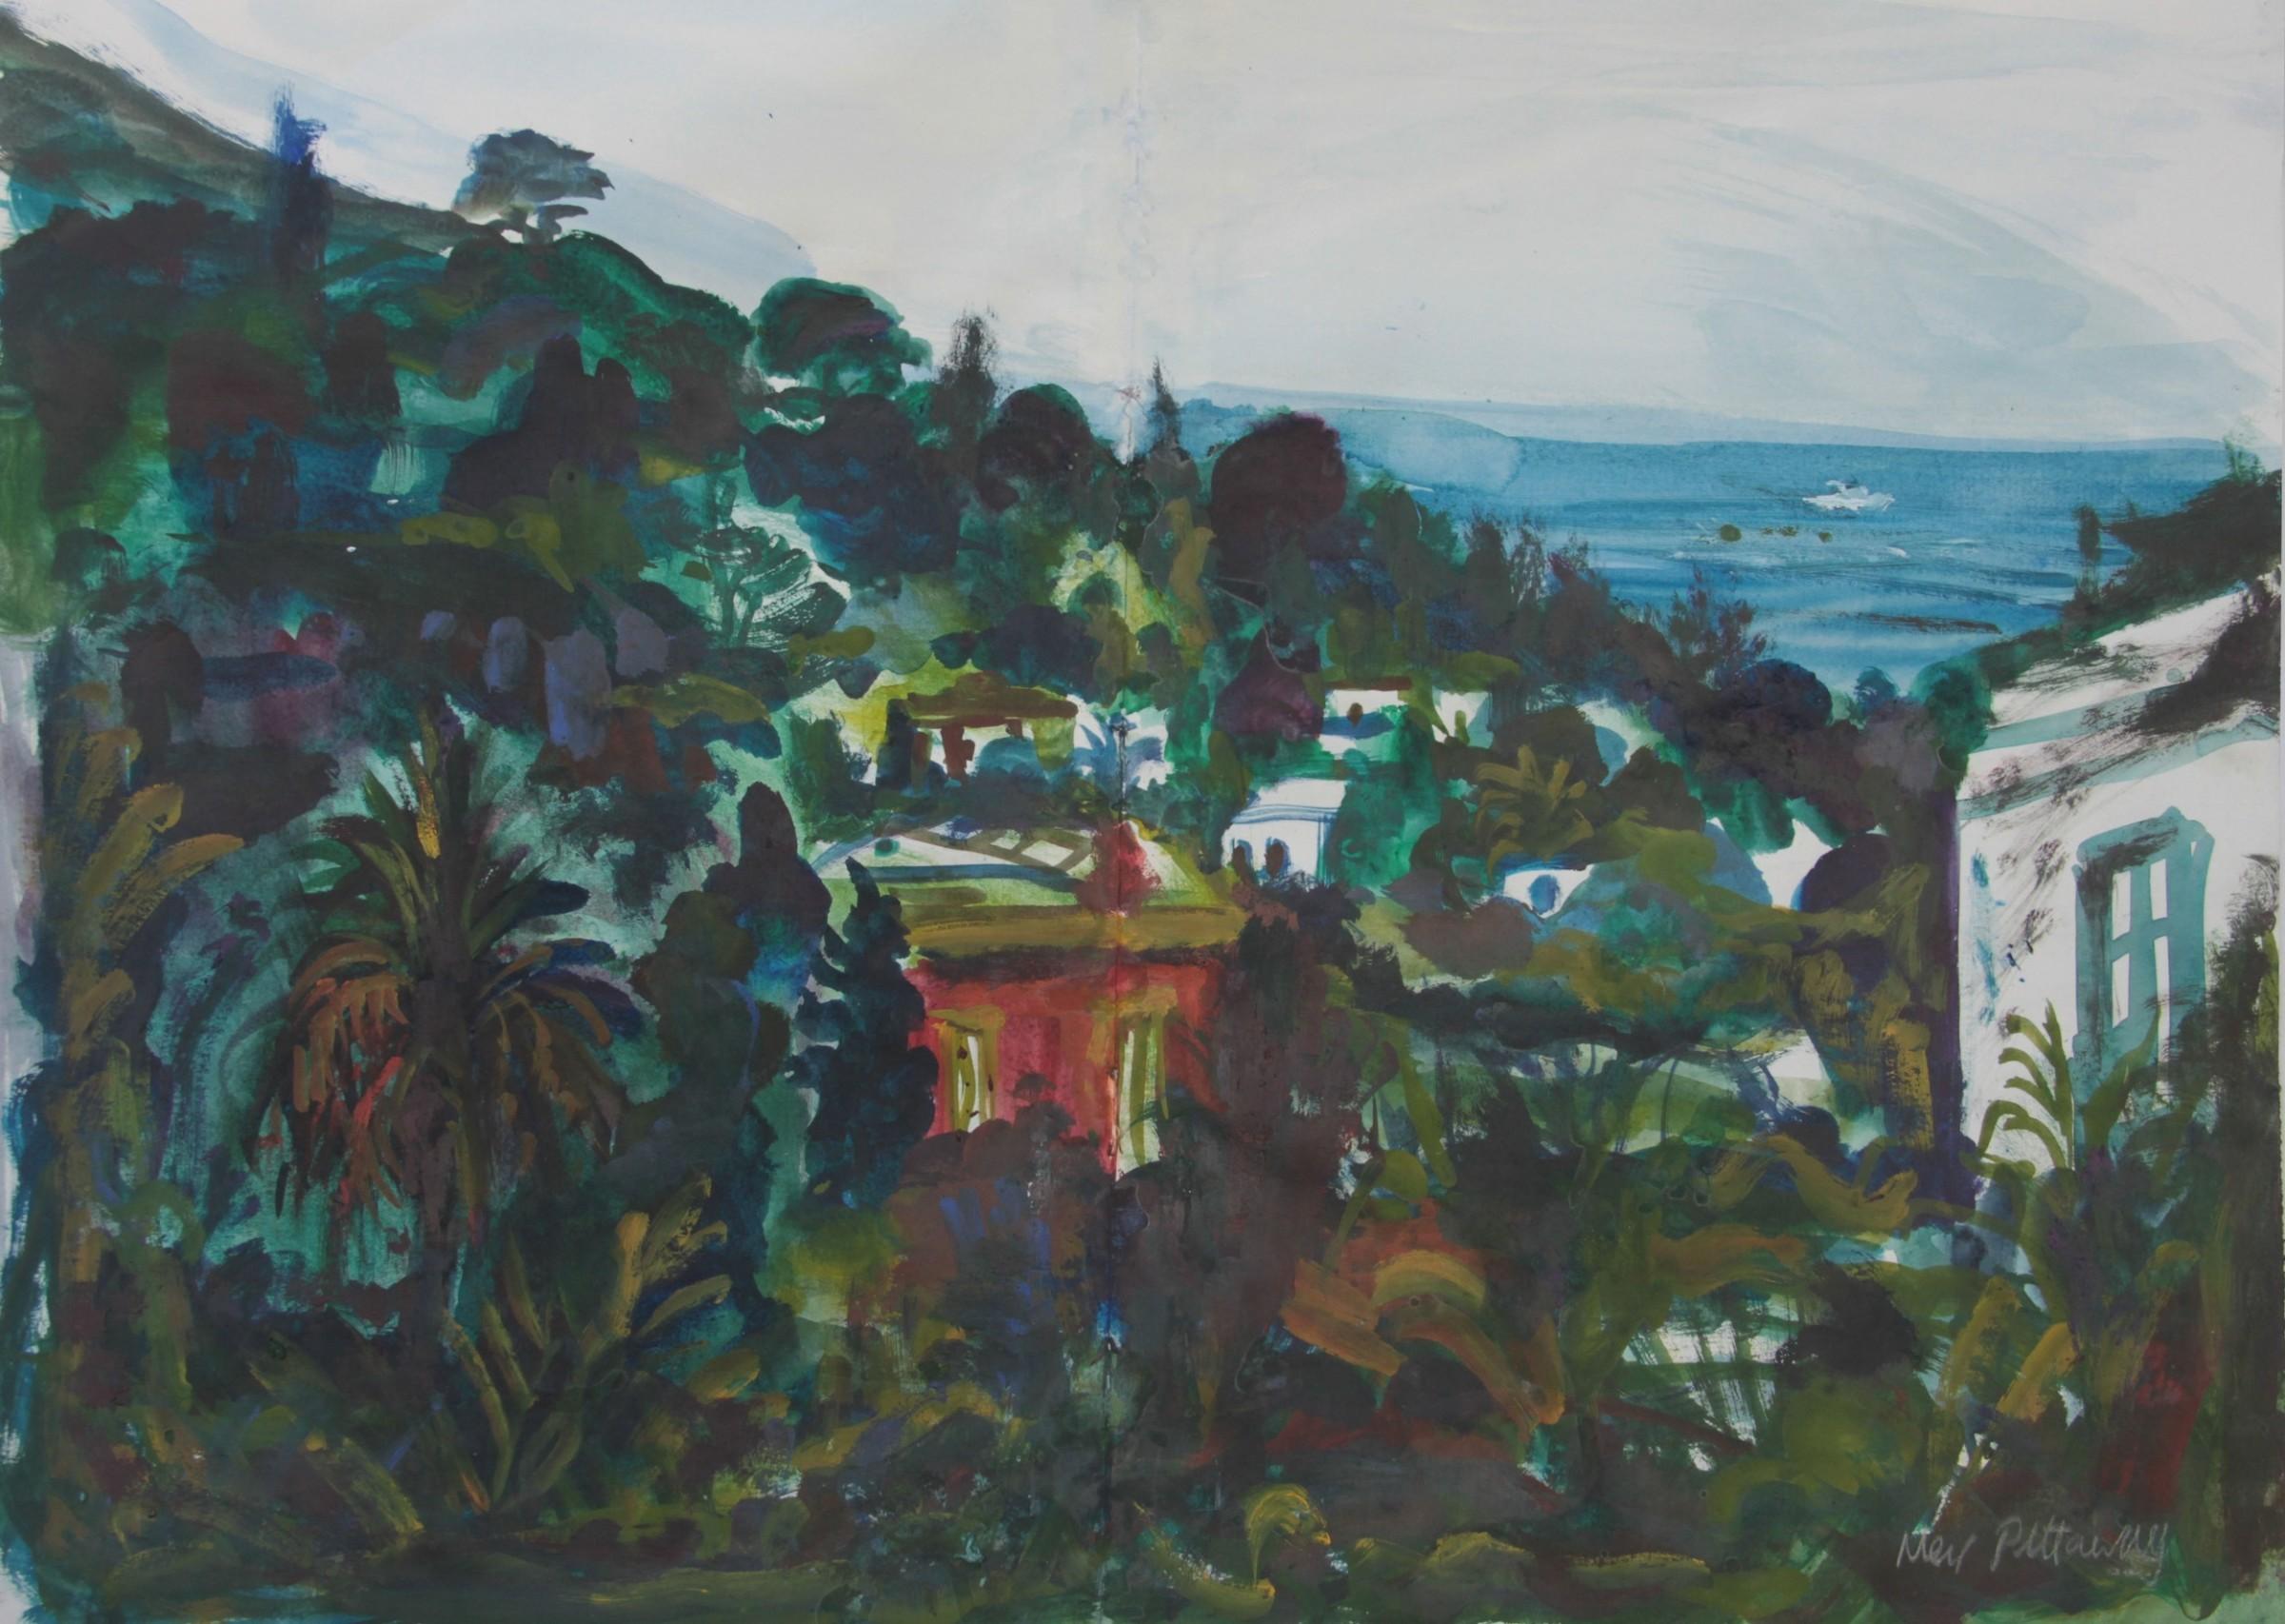 <span class=&#34;link fancybox-details-link&#34;><a href=&#34;/exhibitions/24/works/artworks_standalone10778/&#34;>View Detail Page</a></span><div class=&#34;artist&#34;><span class=&#34;artist&#34;><strong>Neil Pittaway</strong></span></div><div class=&#34;title&#34;><em>View of Ingrid Bergman's House on Stromboli </em></div><div class=&#34;medium&#34;>watercolour</div><div class=&#34;dimensions&#34;>52x65cm</div>